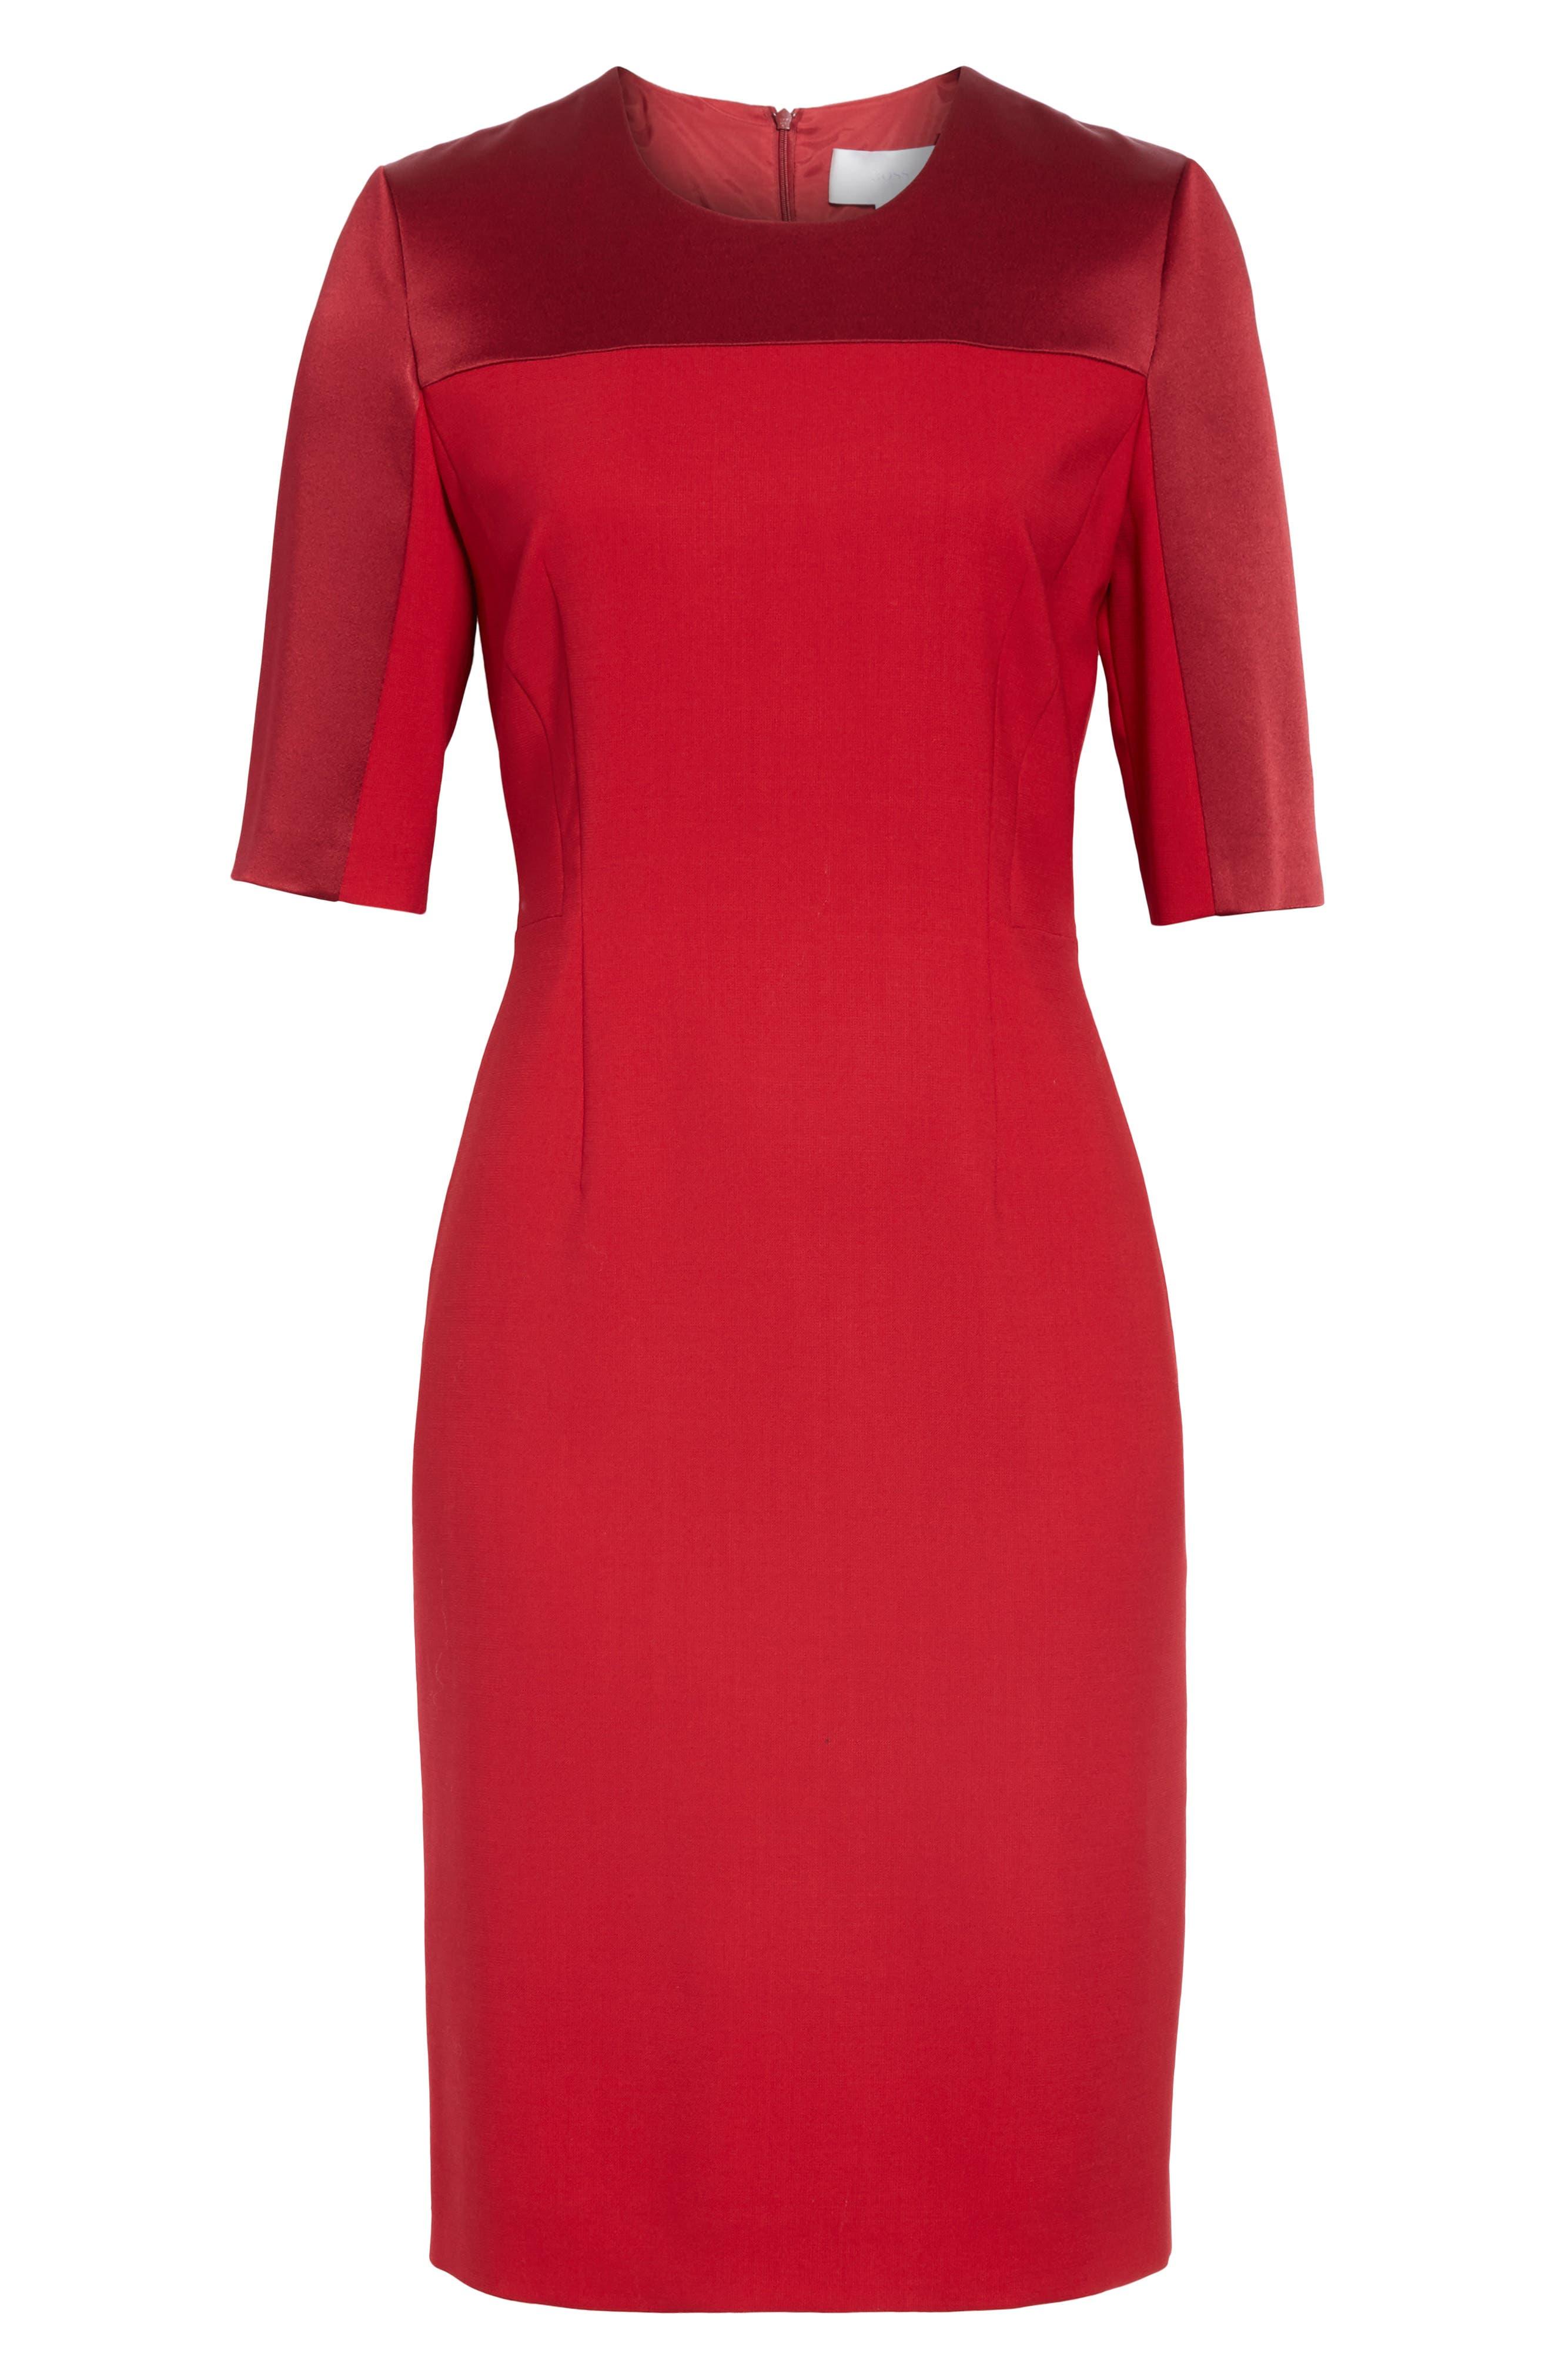 Danufa Stretch Wool Sheath Dress,                             Alternate thumbnail 7, color,                             DARK RED